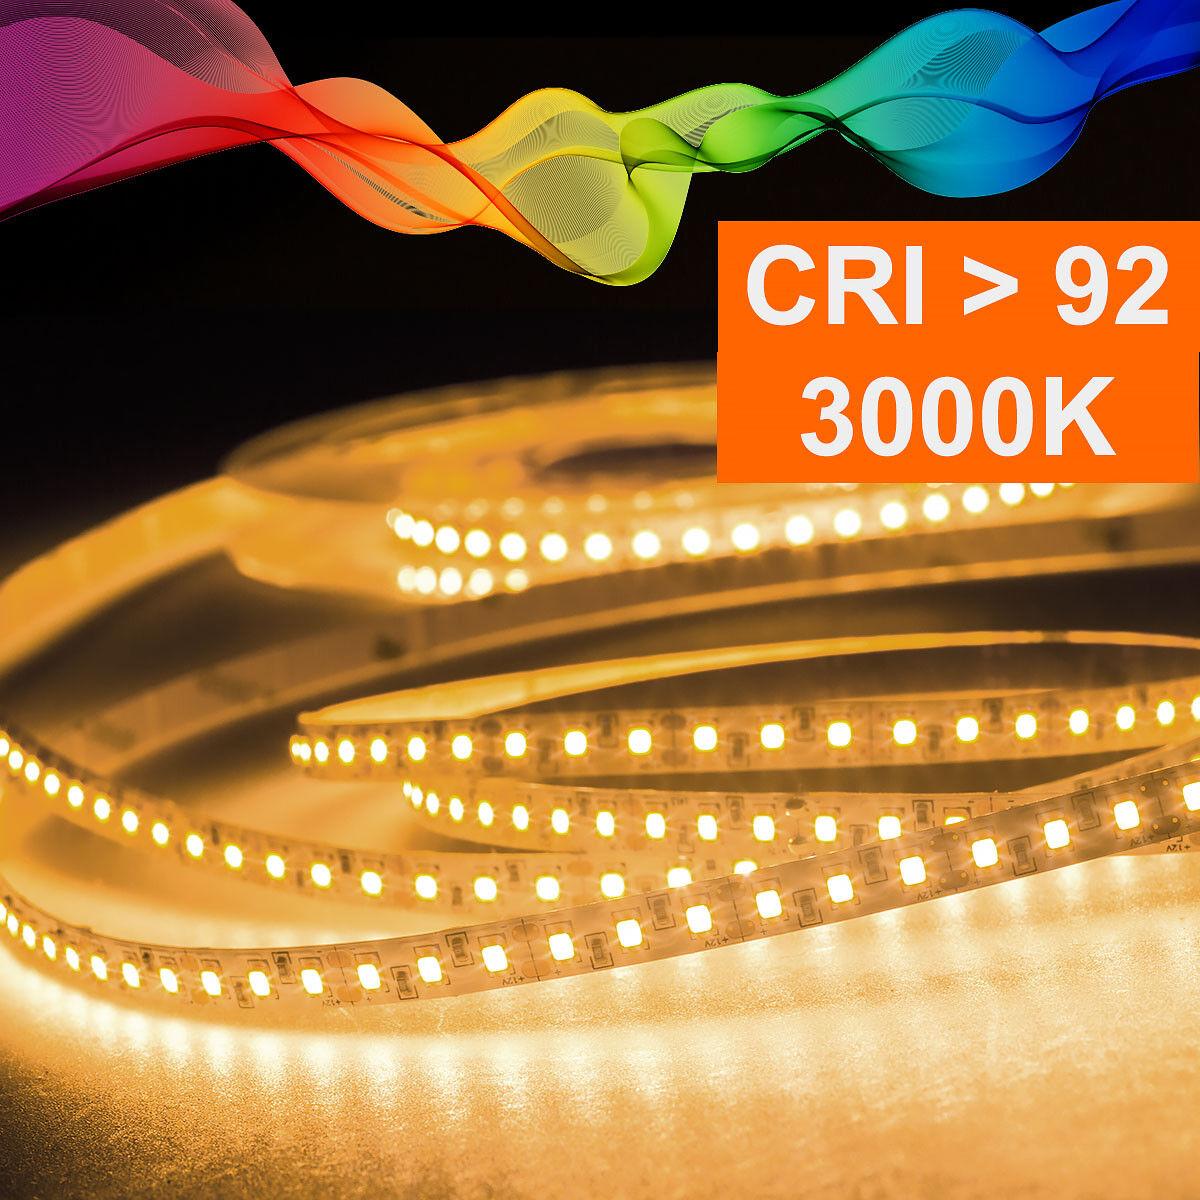 LED Strip 2835 Warmweiß (3000K) CRI 92 36W 5 Meter 12V IP20